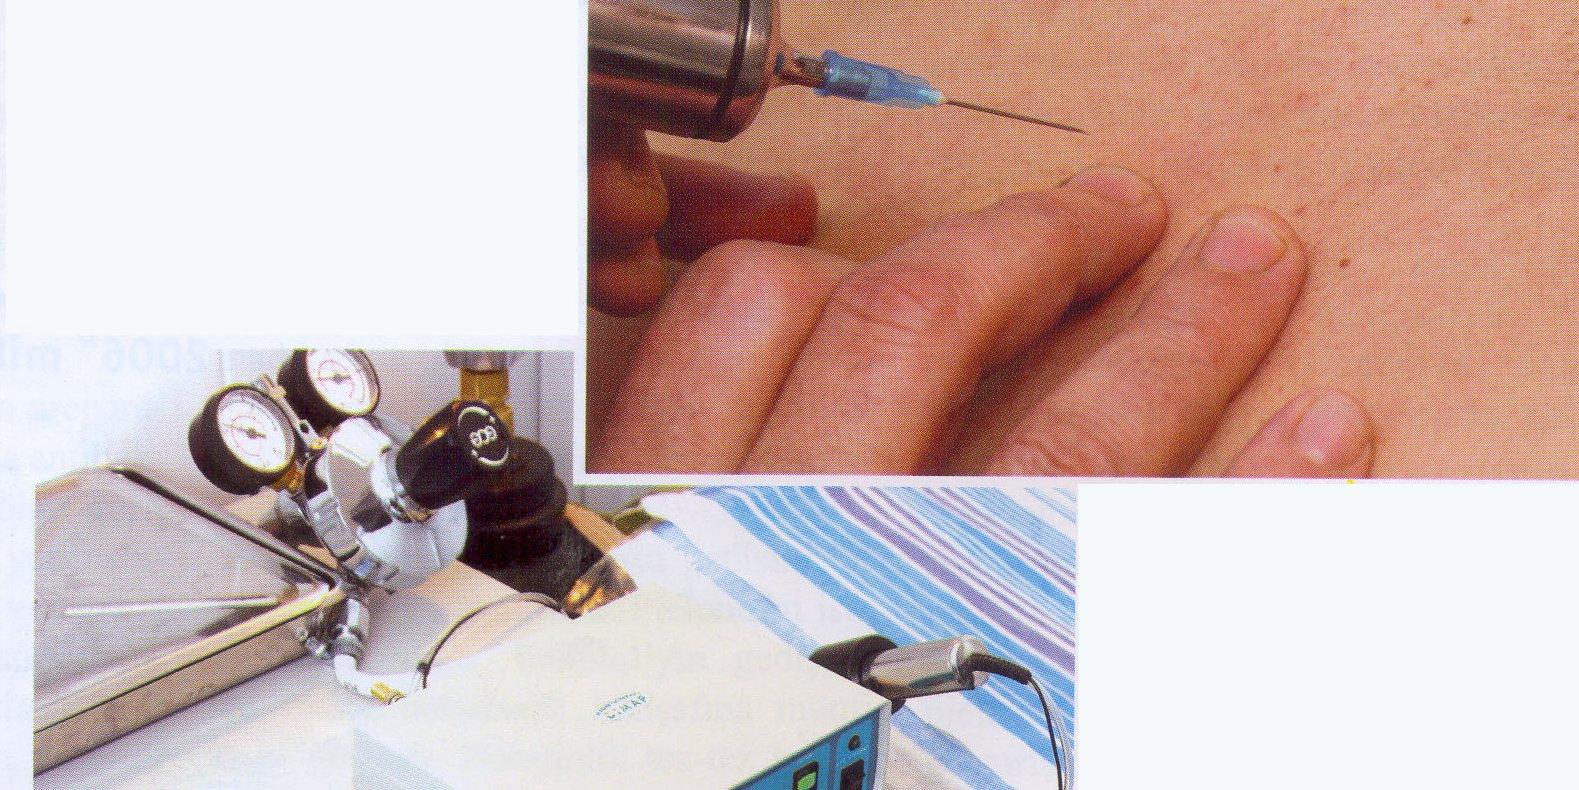 Pnevapunktura